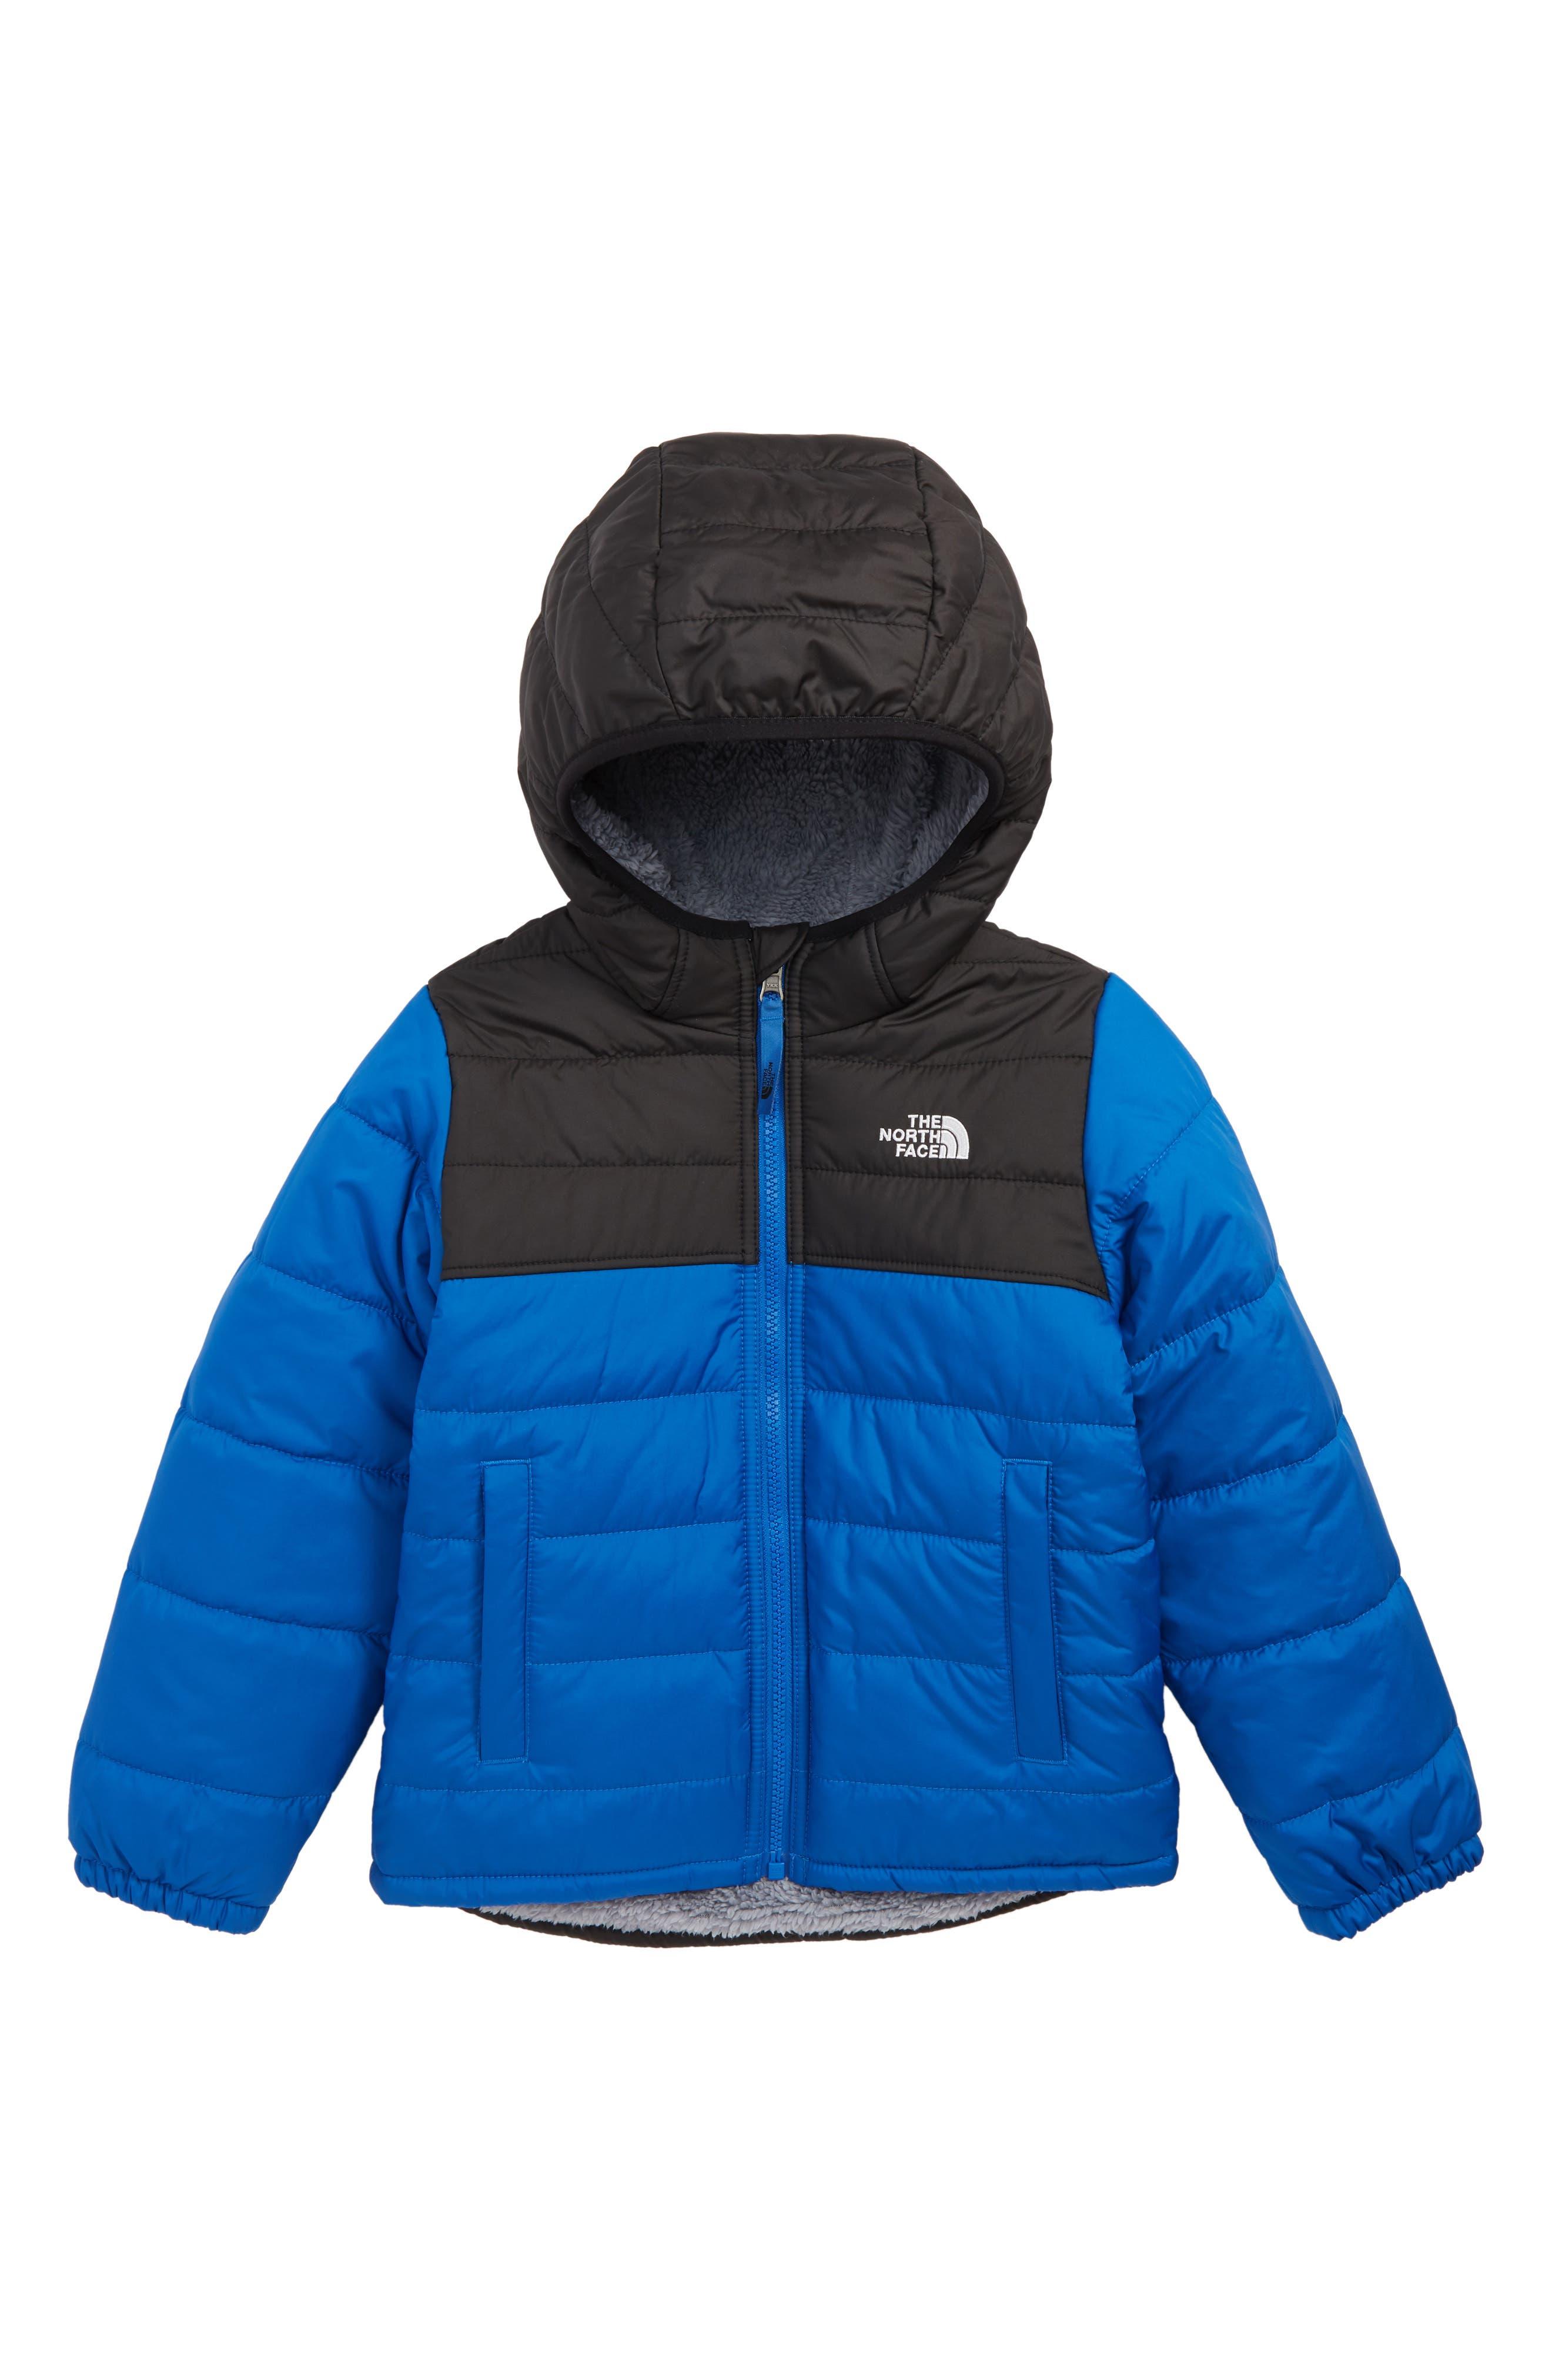 Toddler Boys The North Face Chimborazo Reversible Jacket Size 2T  Blue